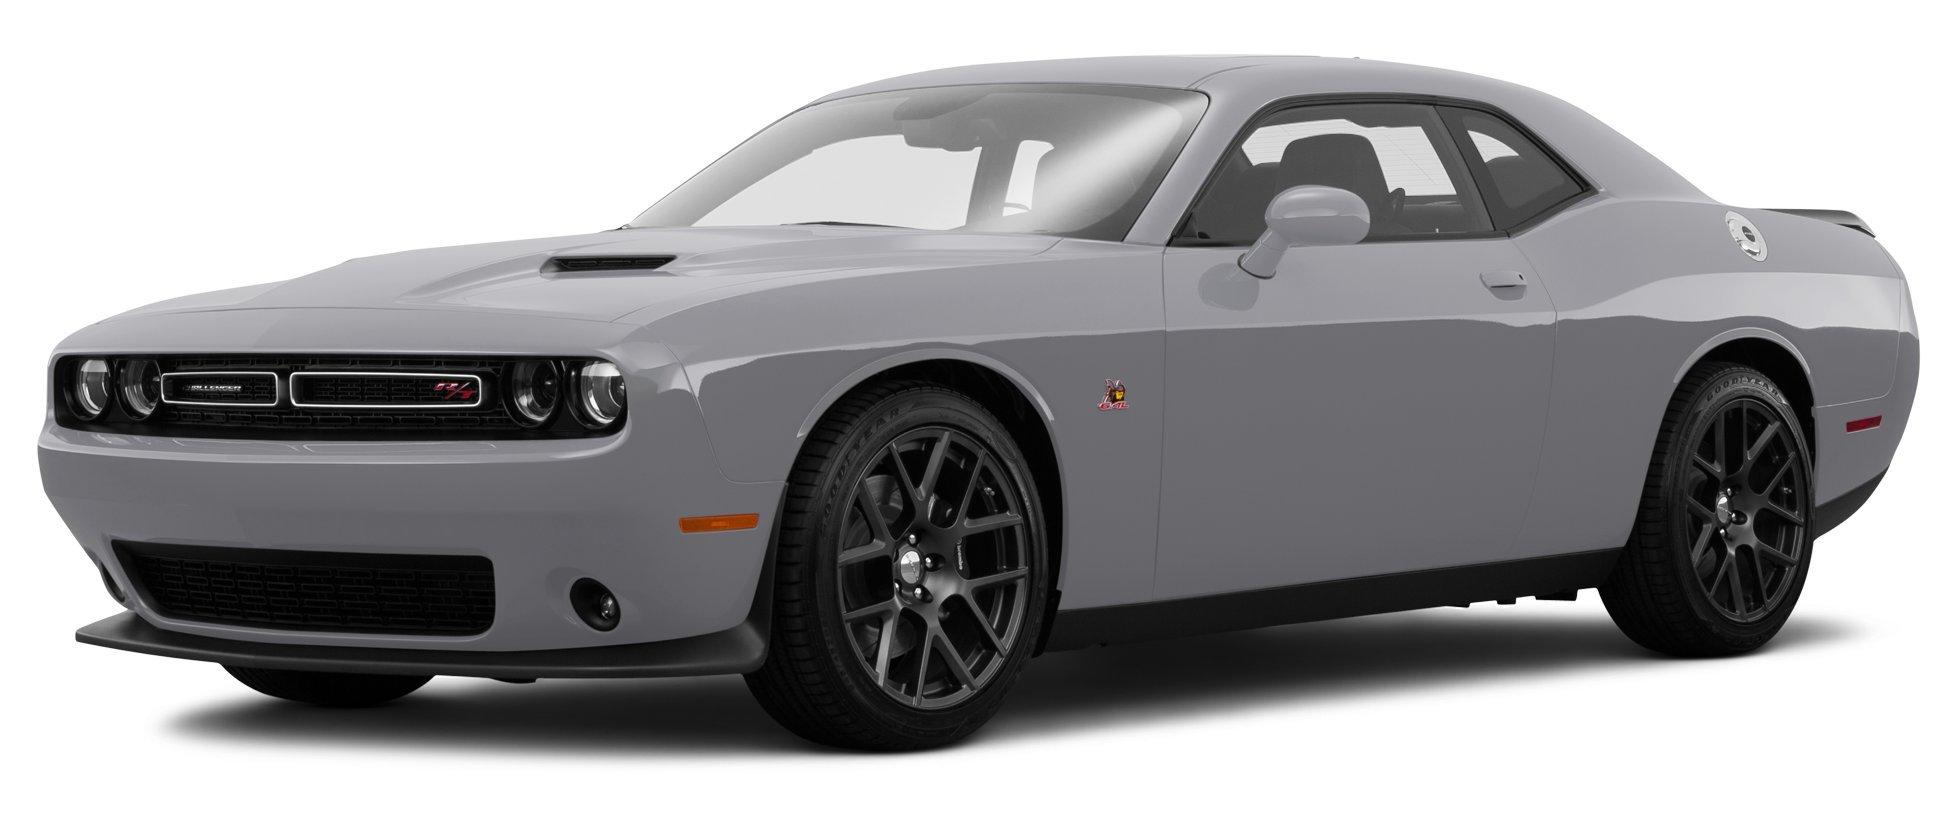 Amazon Com 2017 Dodge Challenger Reviews Images And Specs Vehicles